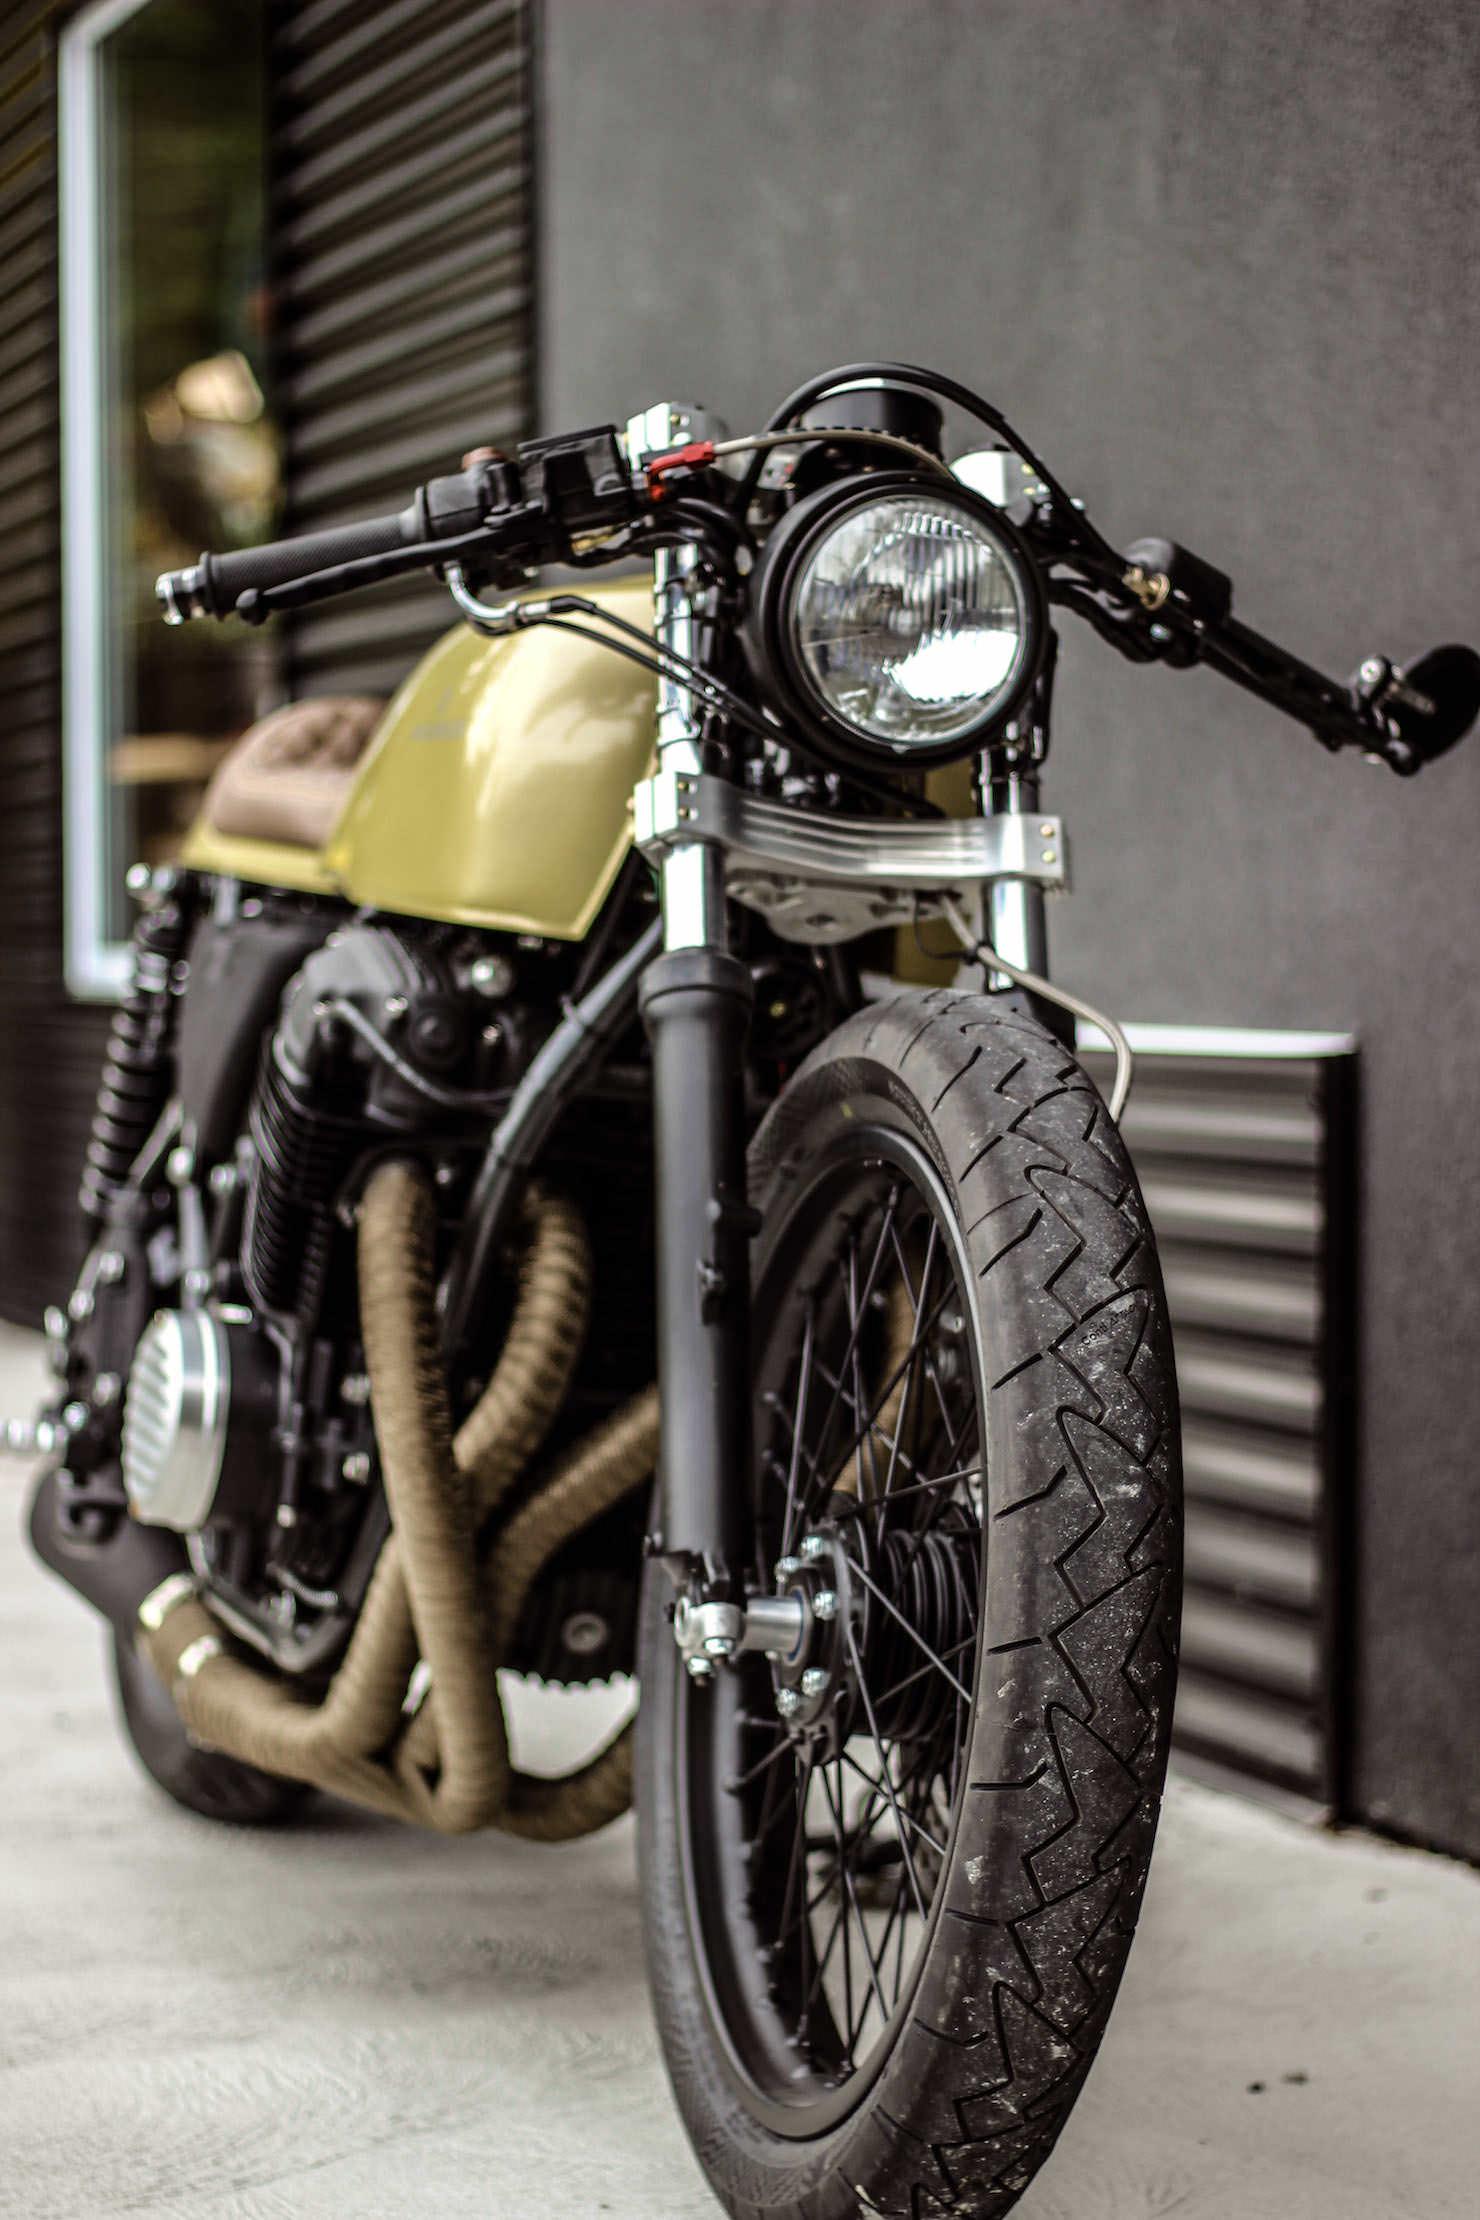 Honda CB750 Custom by Purebreed Fine Motorcycles